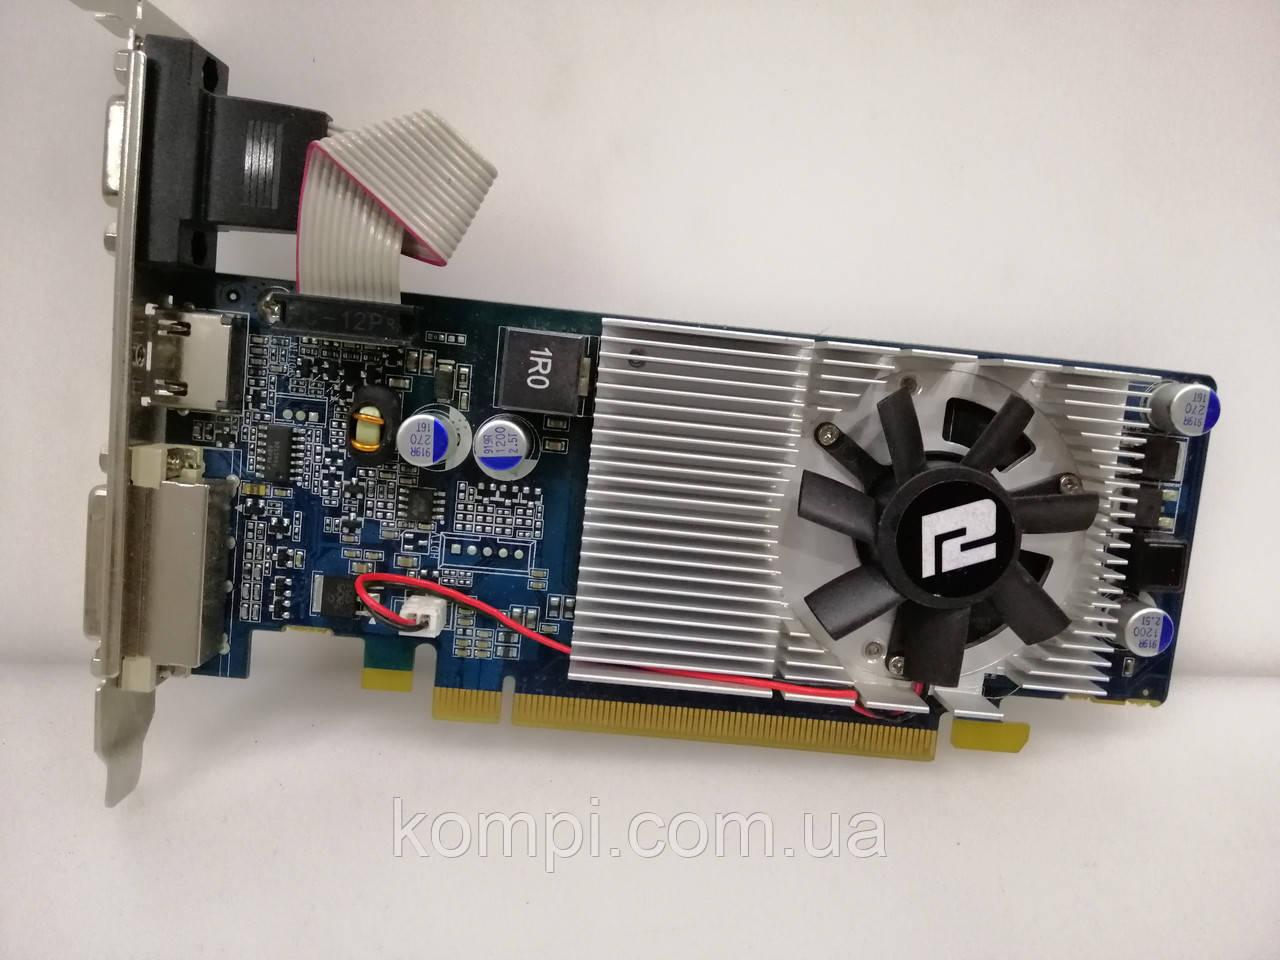 Видеокарта NVIDIA GT 210 512 MB PCI-E HDMI